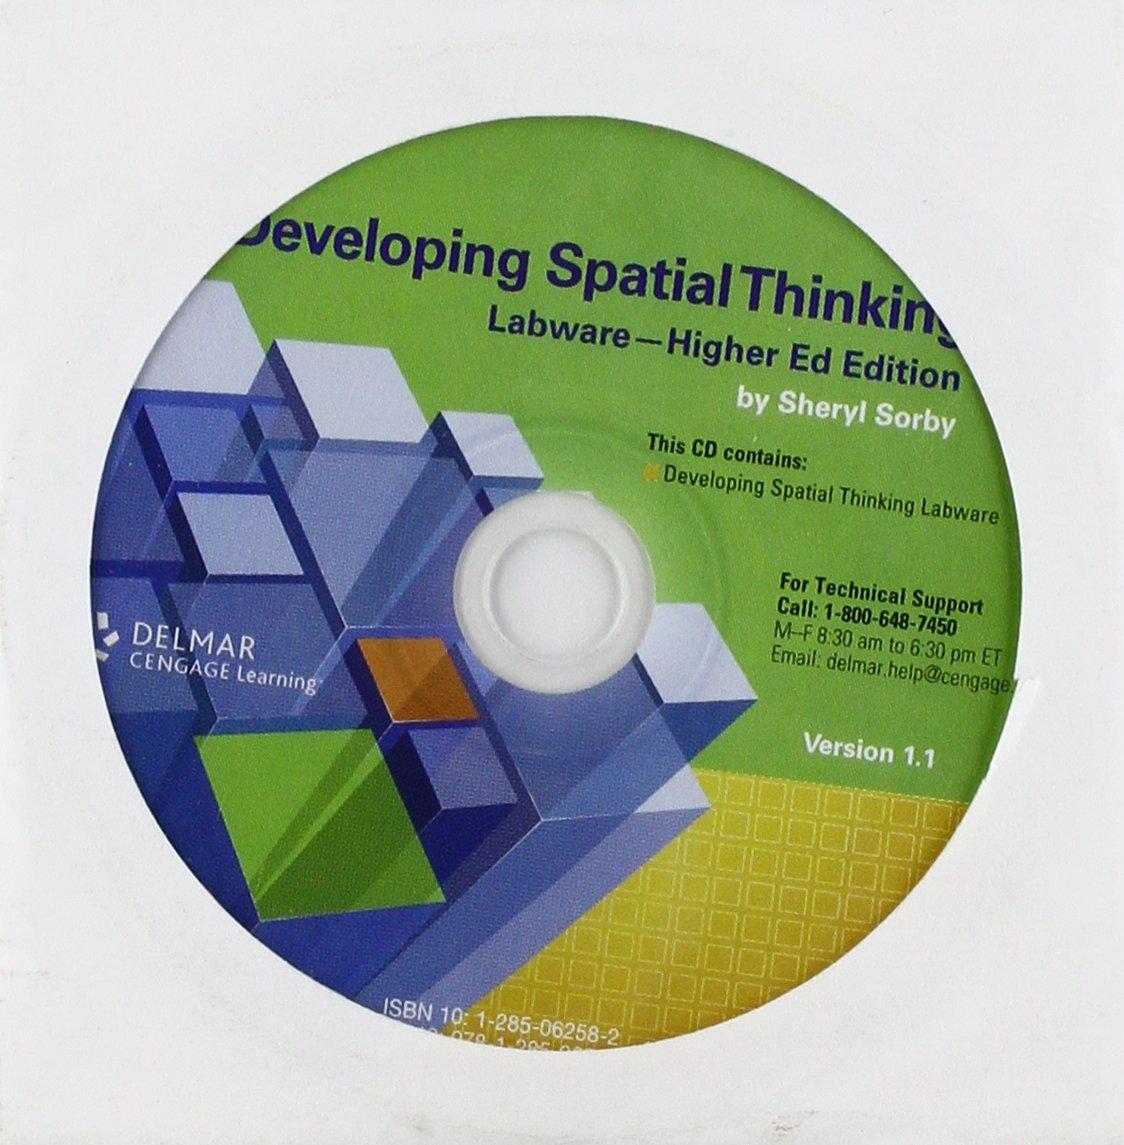 Workbooks developing spatial thinking workbook : Developing Spatial Thinking Labware on CD, Higher Education ...